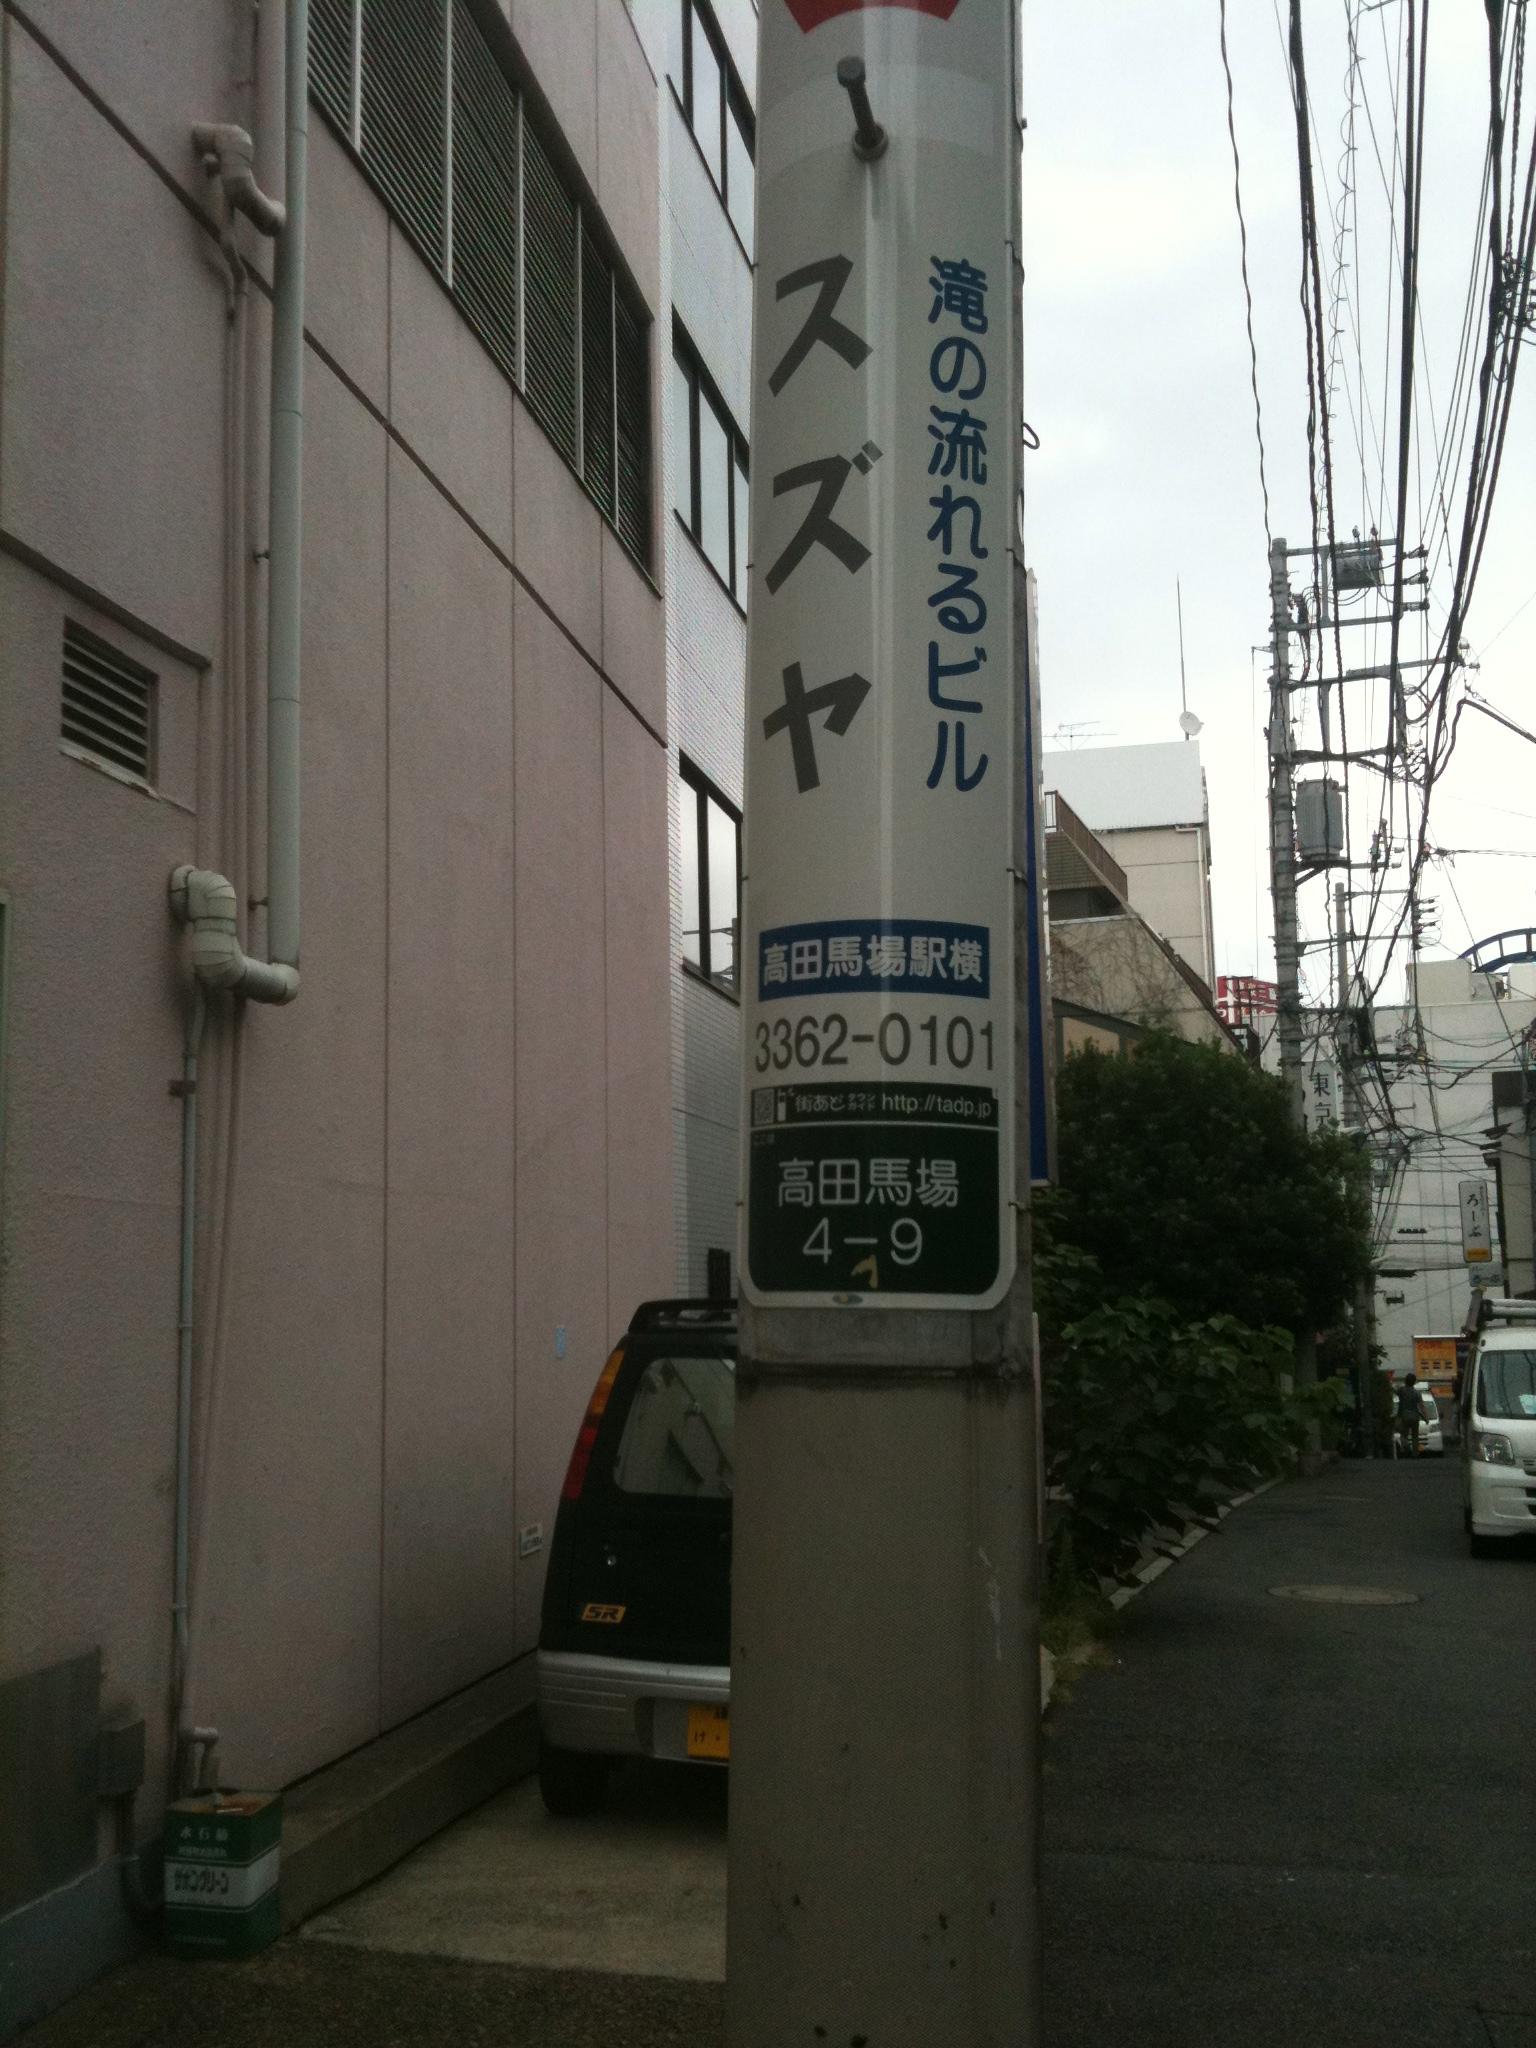 Takadanobaba 4-9